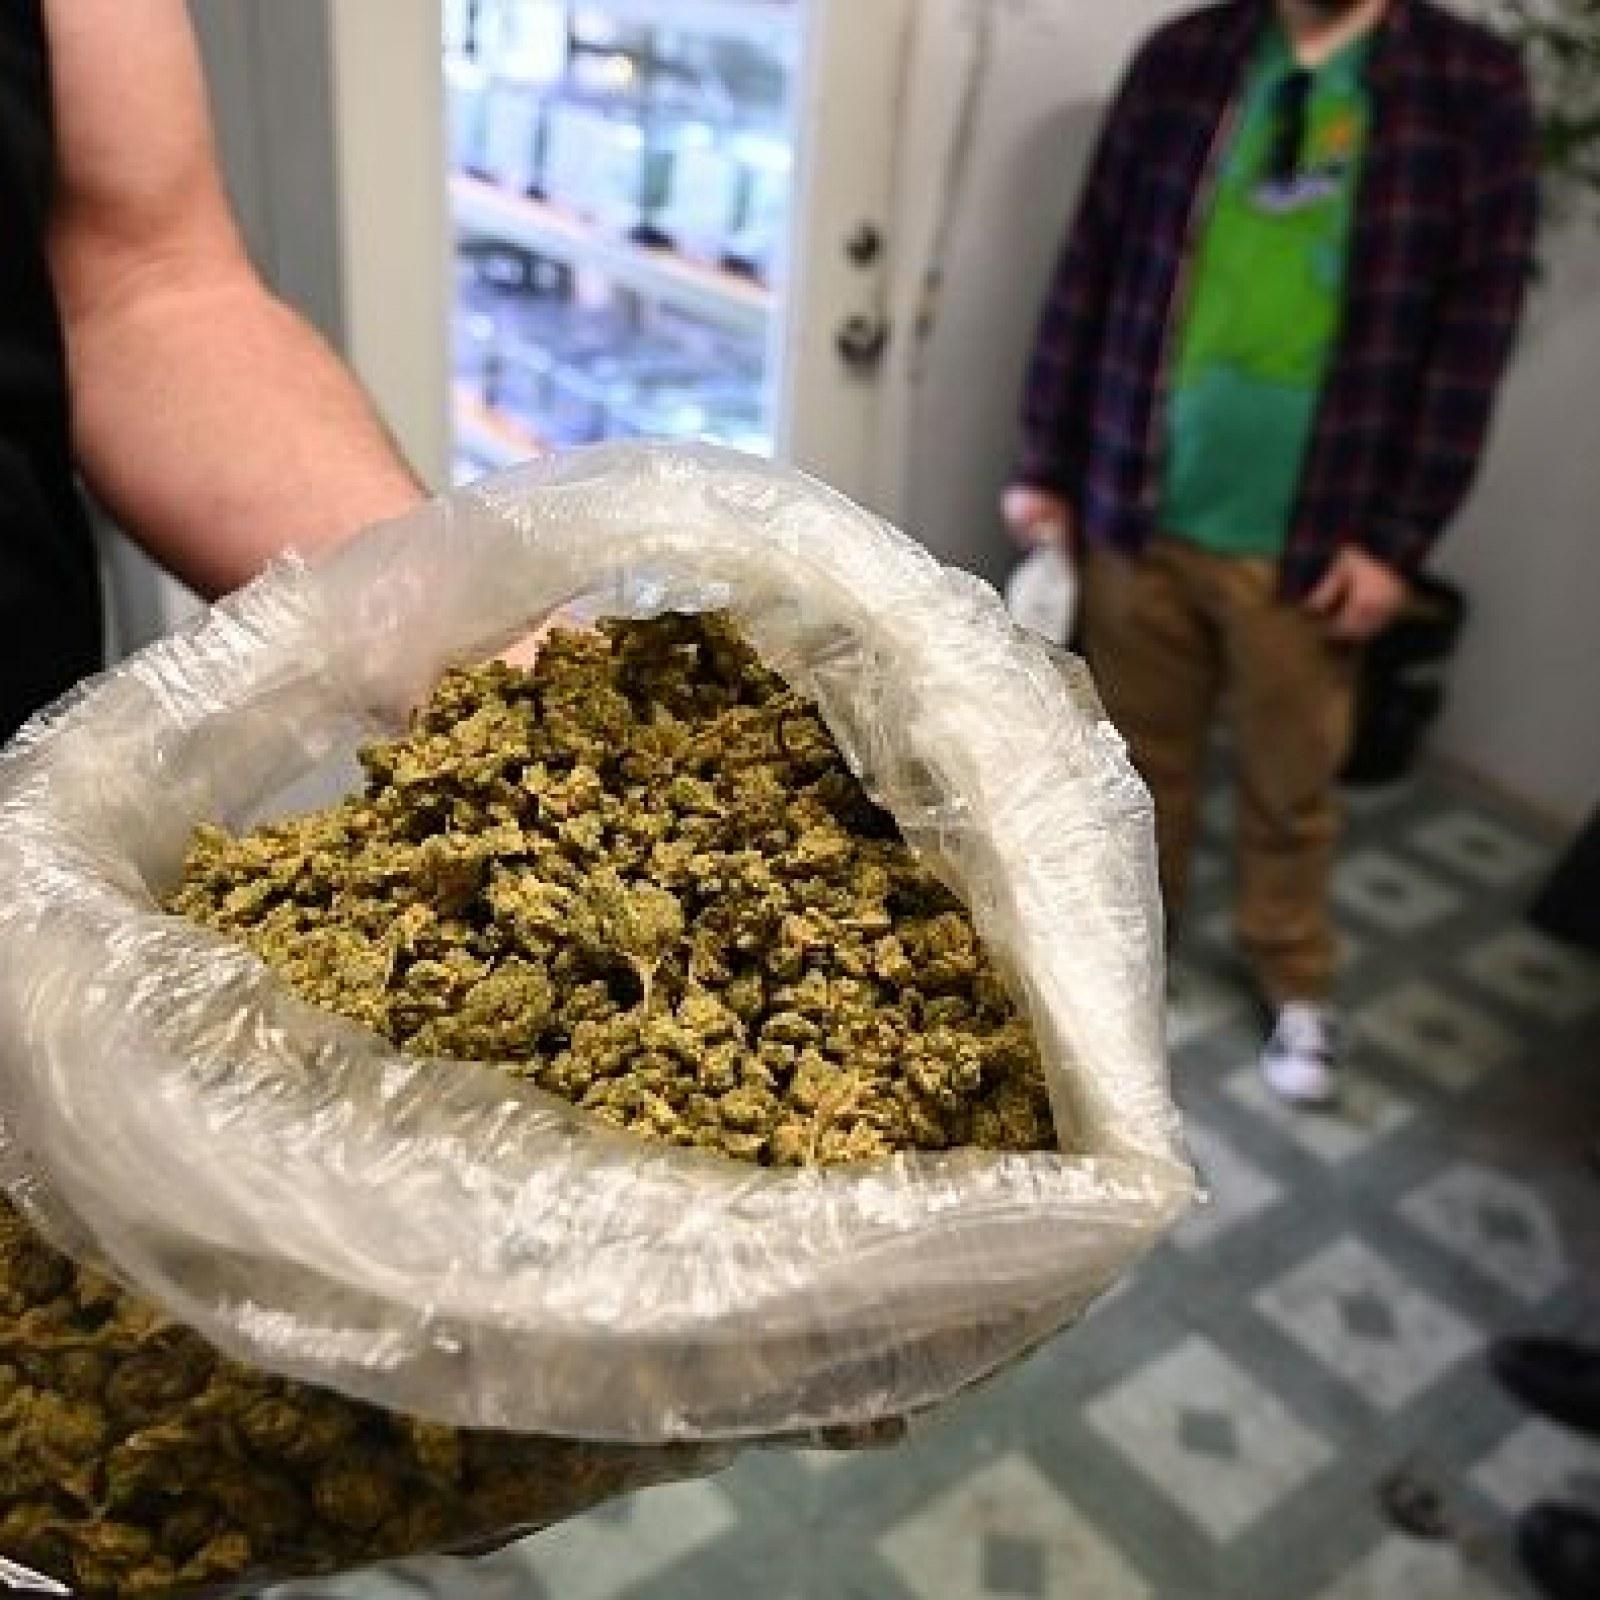 Legal Weed: Texas Rejects Bill to Reduce Marijuana Penalties Despite